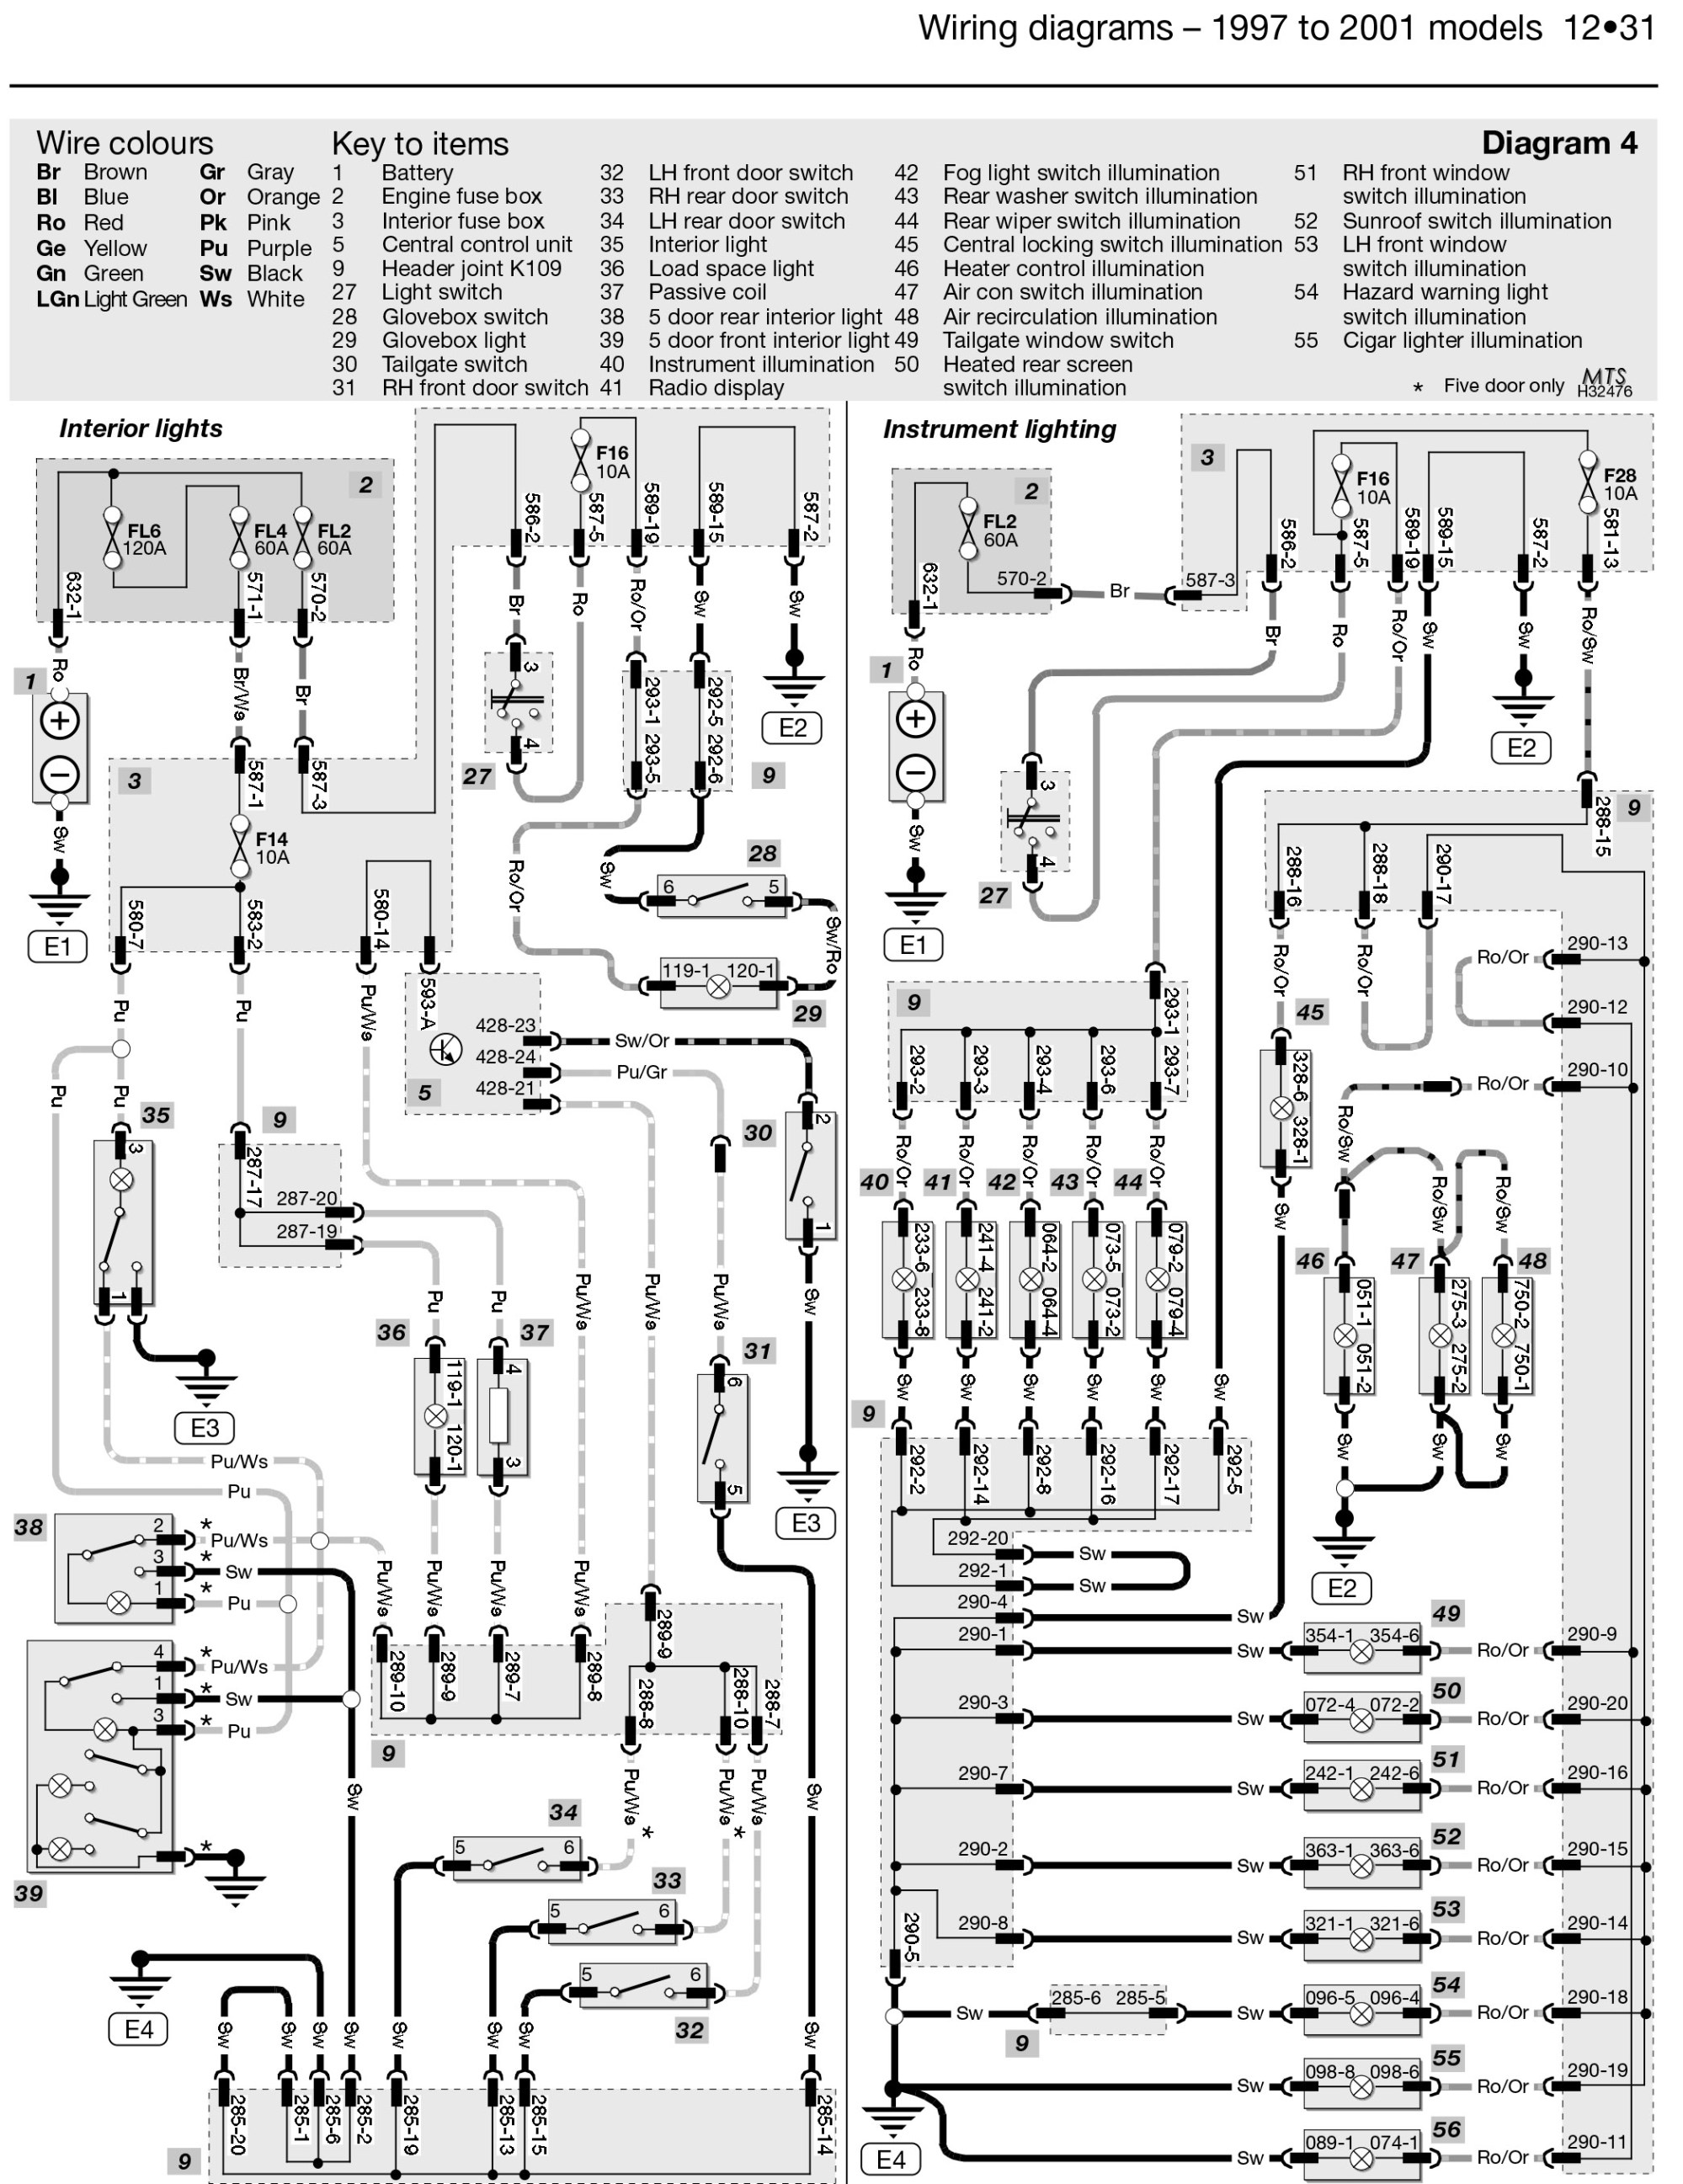 hight resolution of for a 2004 freelander engine diagram use wiring diagram freelander towbar wiring diagram freelander wiring diagram